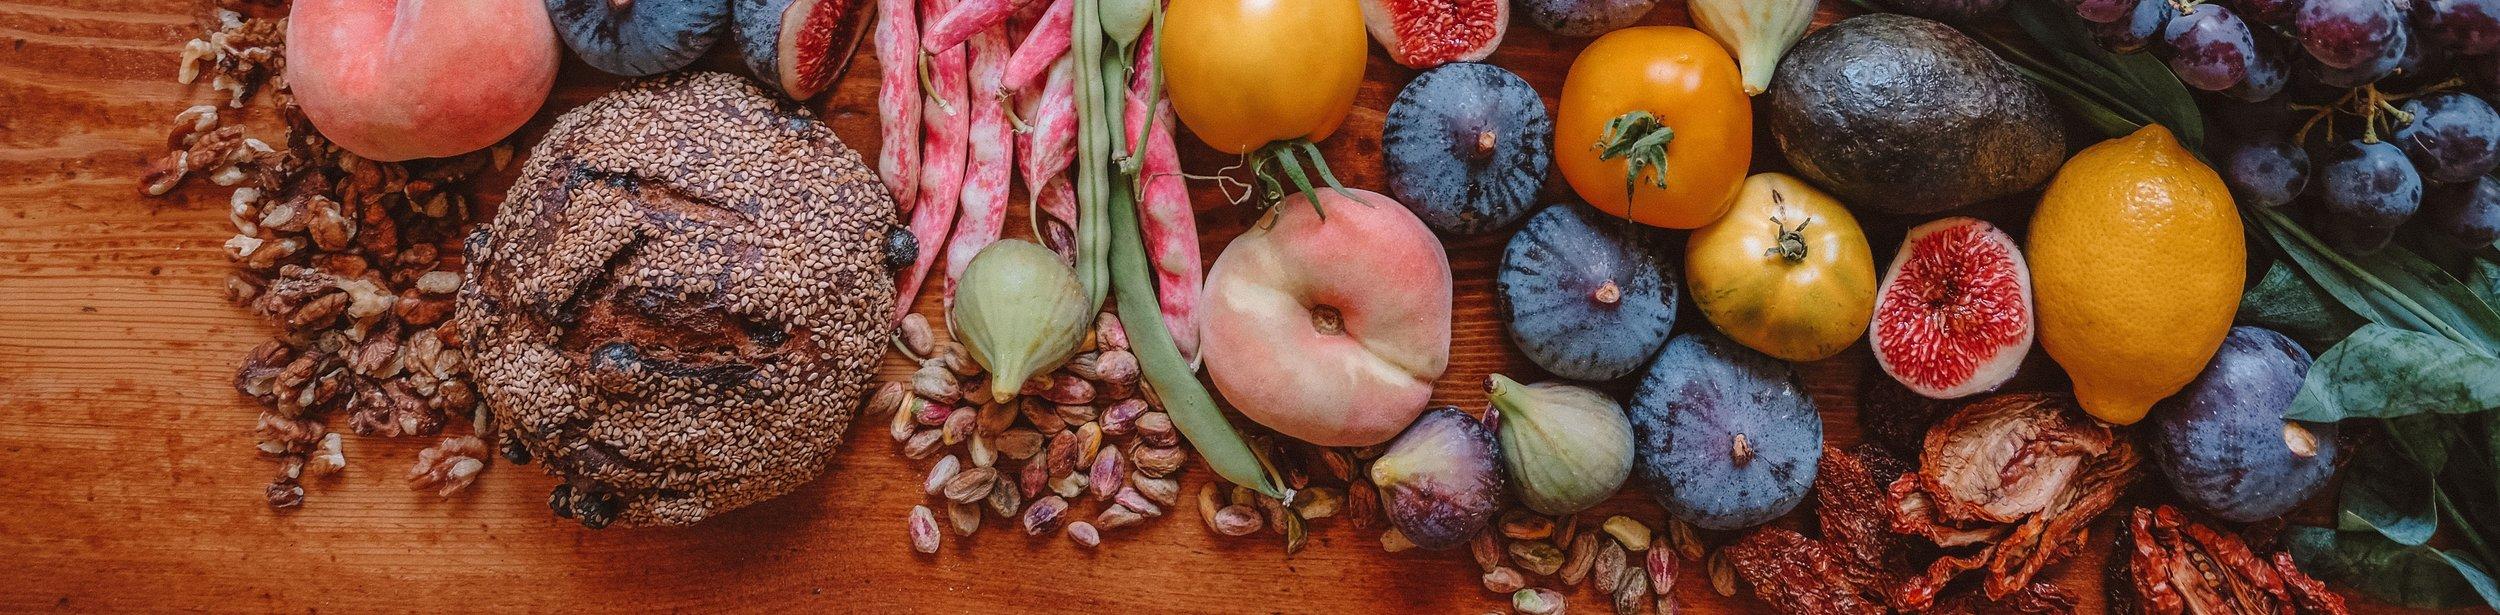 INDIVIDUAL PRACTICALS - One-off Practical Nutrition CoachingLet's make it happen